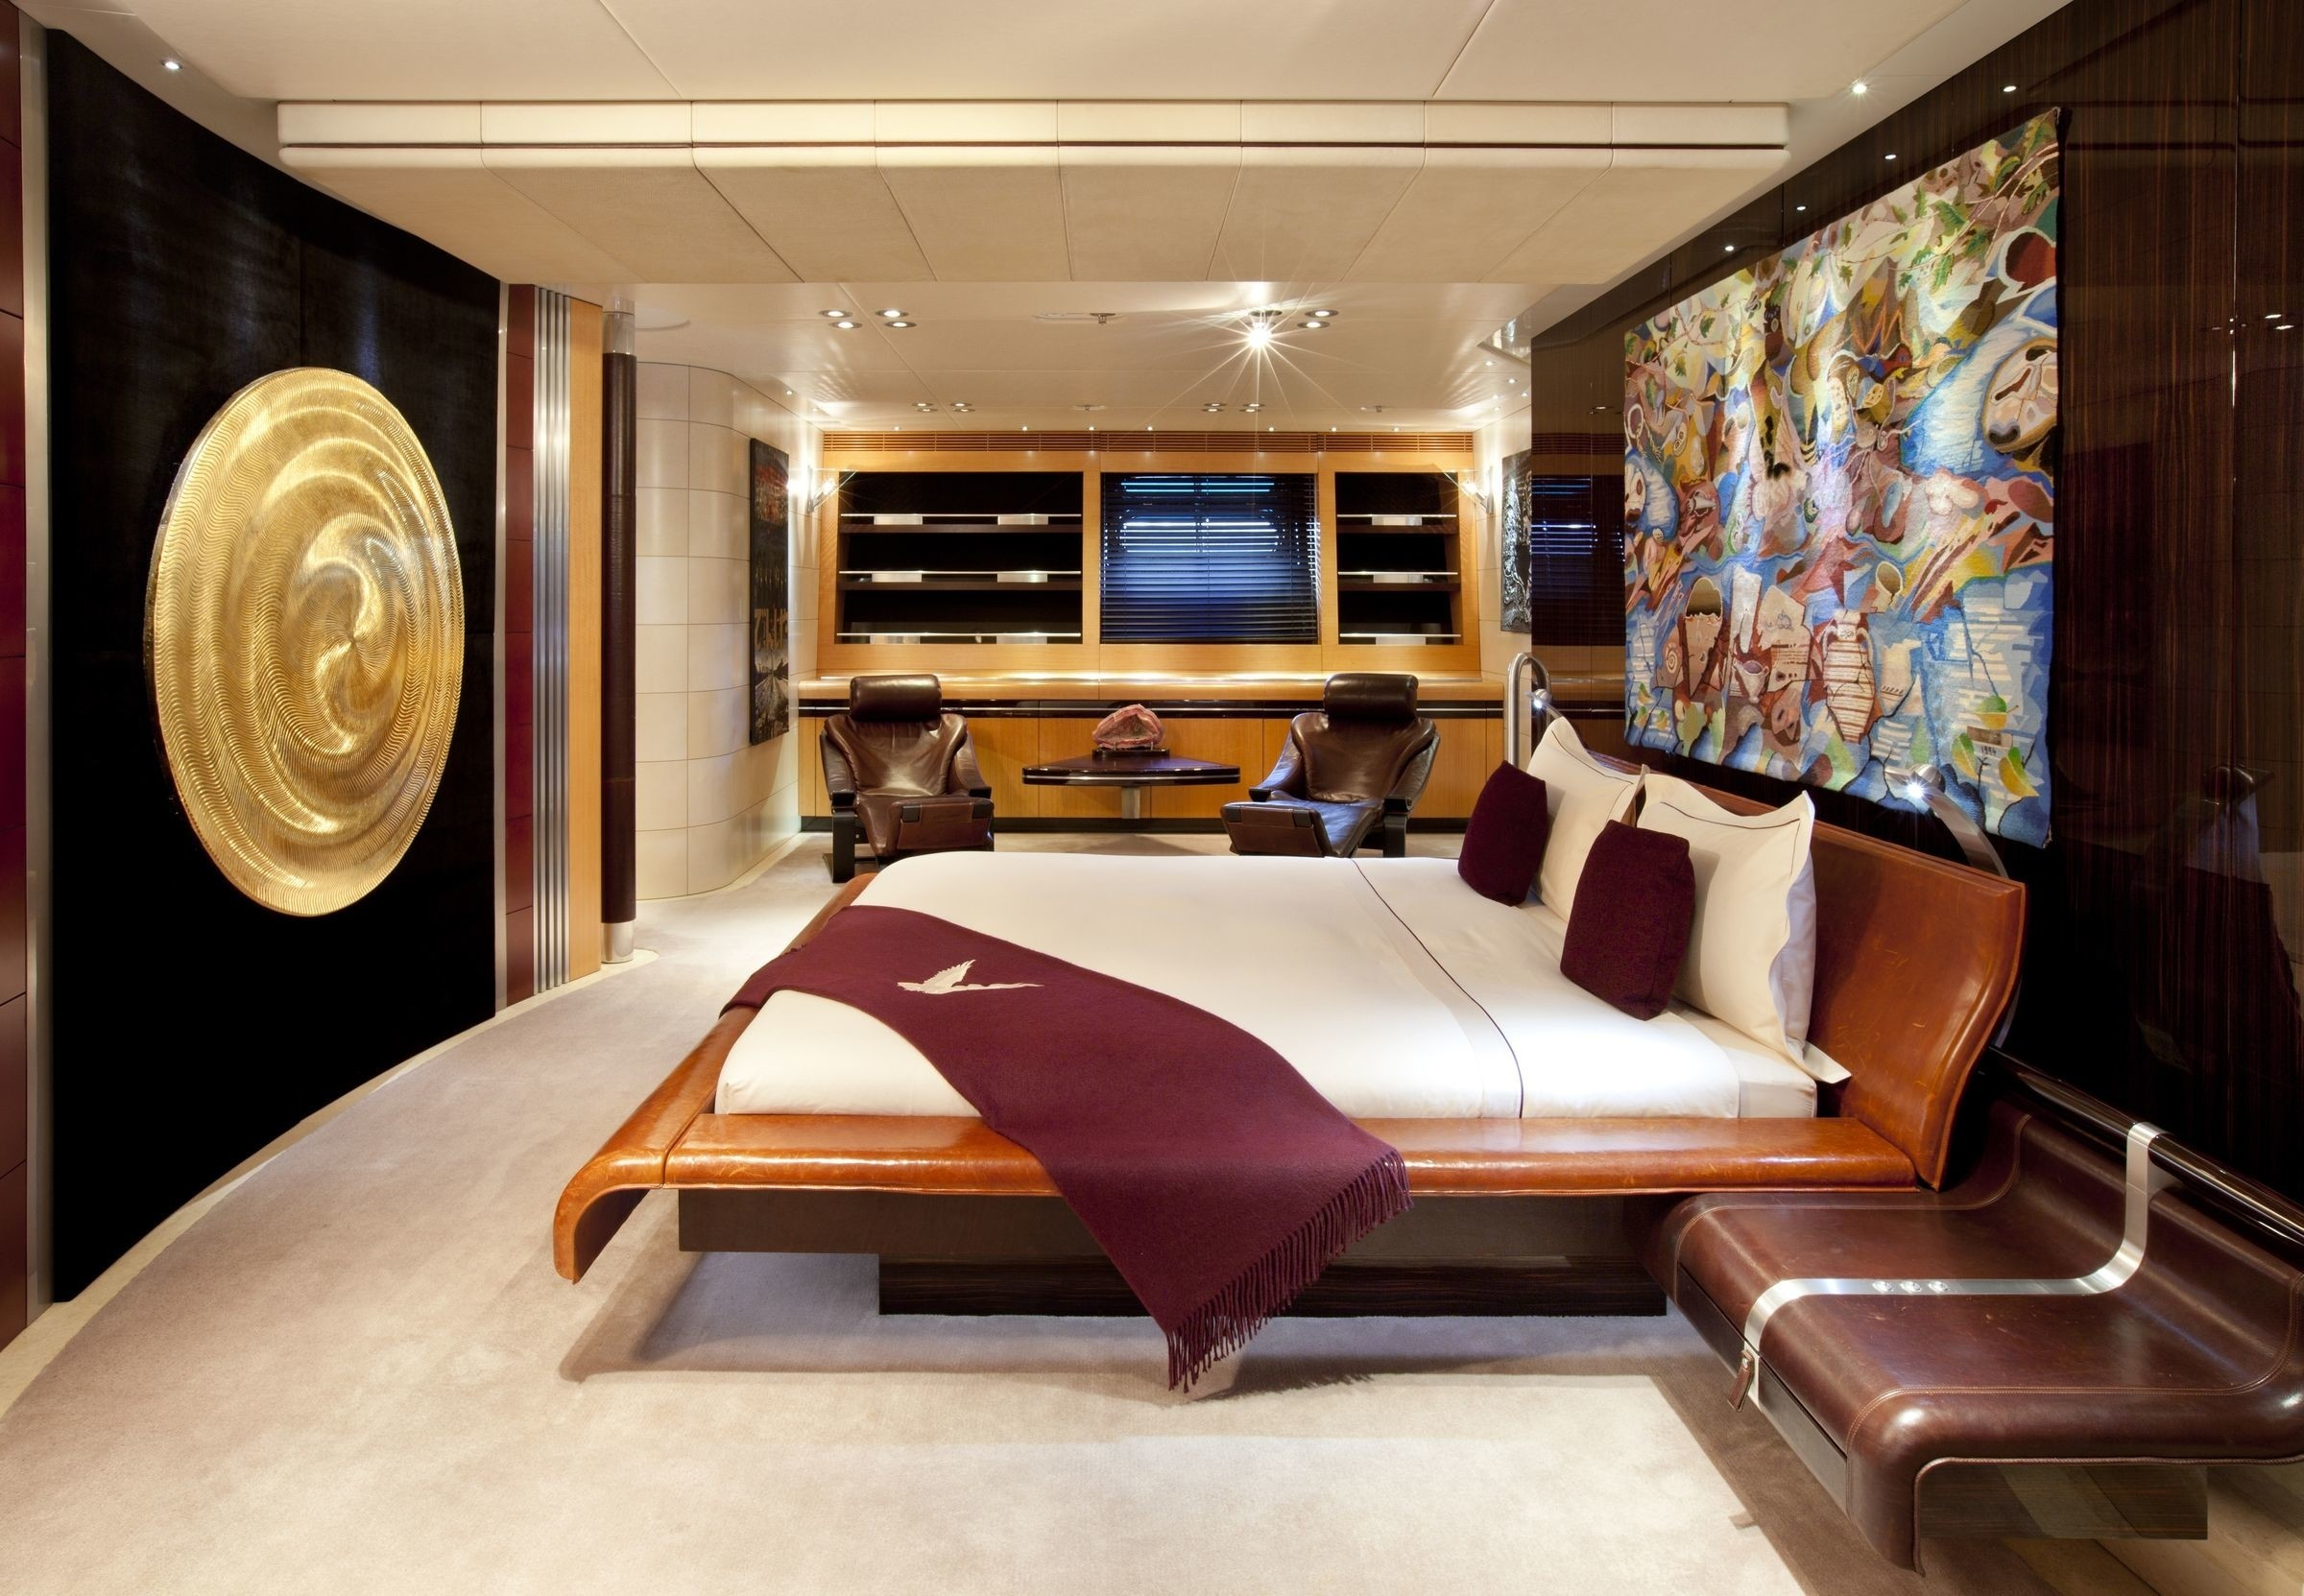 Guest's Cabin Aboard Yacht MALTESE FALCON